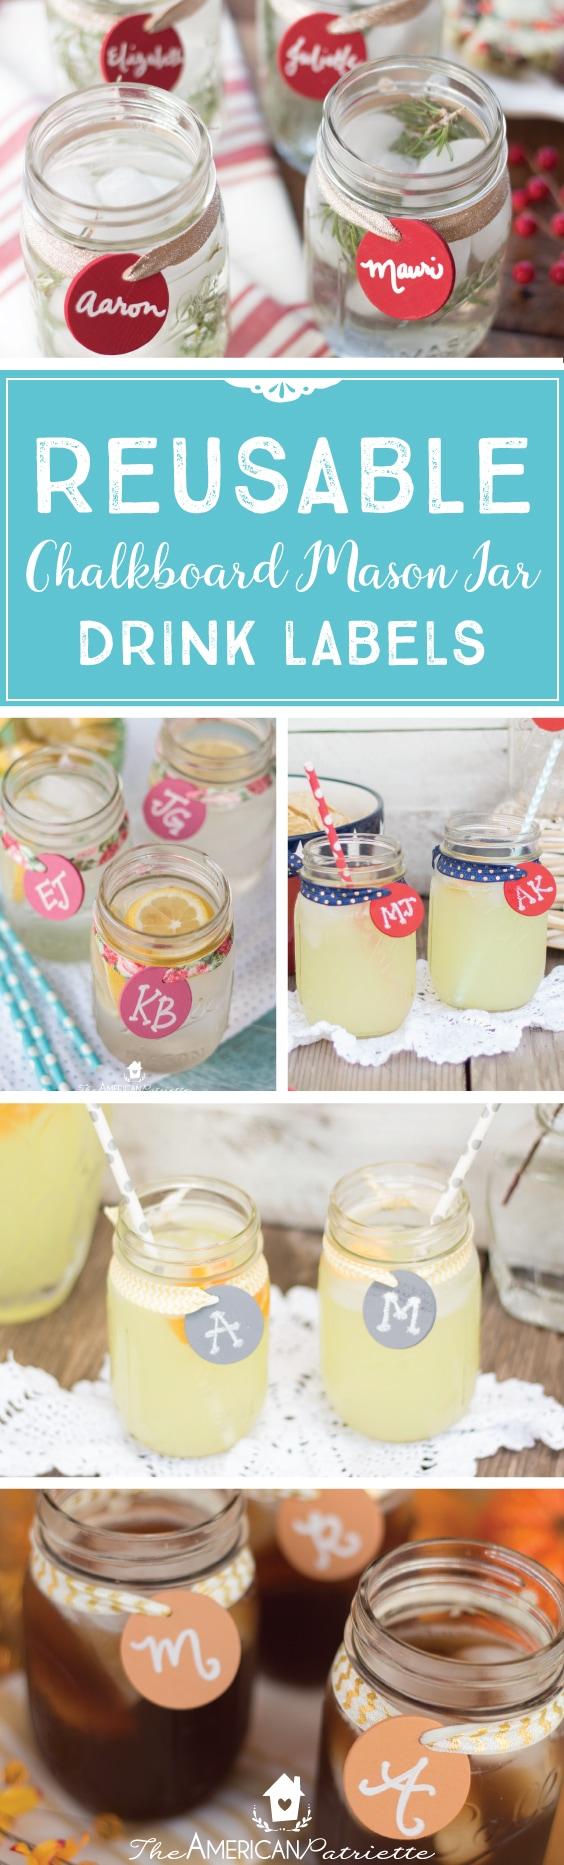 Reusable Chalkboard Mason Jar Drink Labels